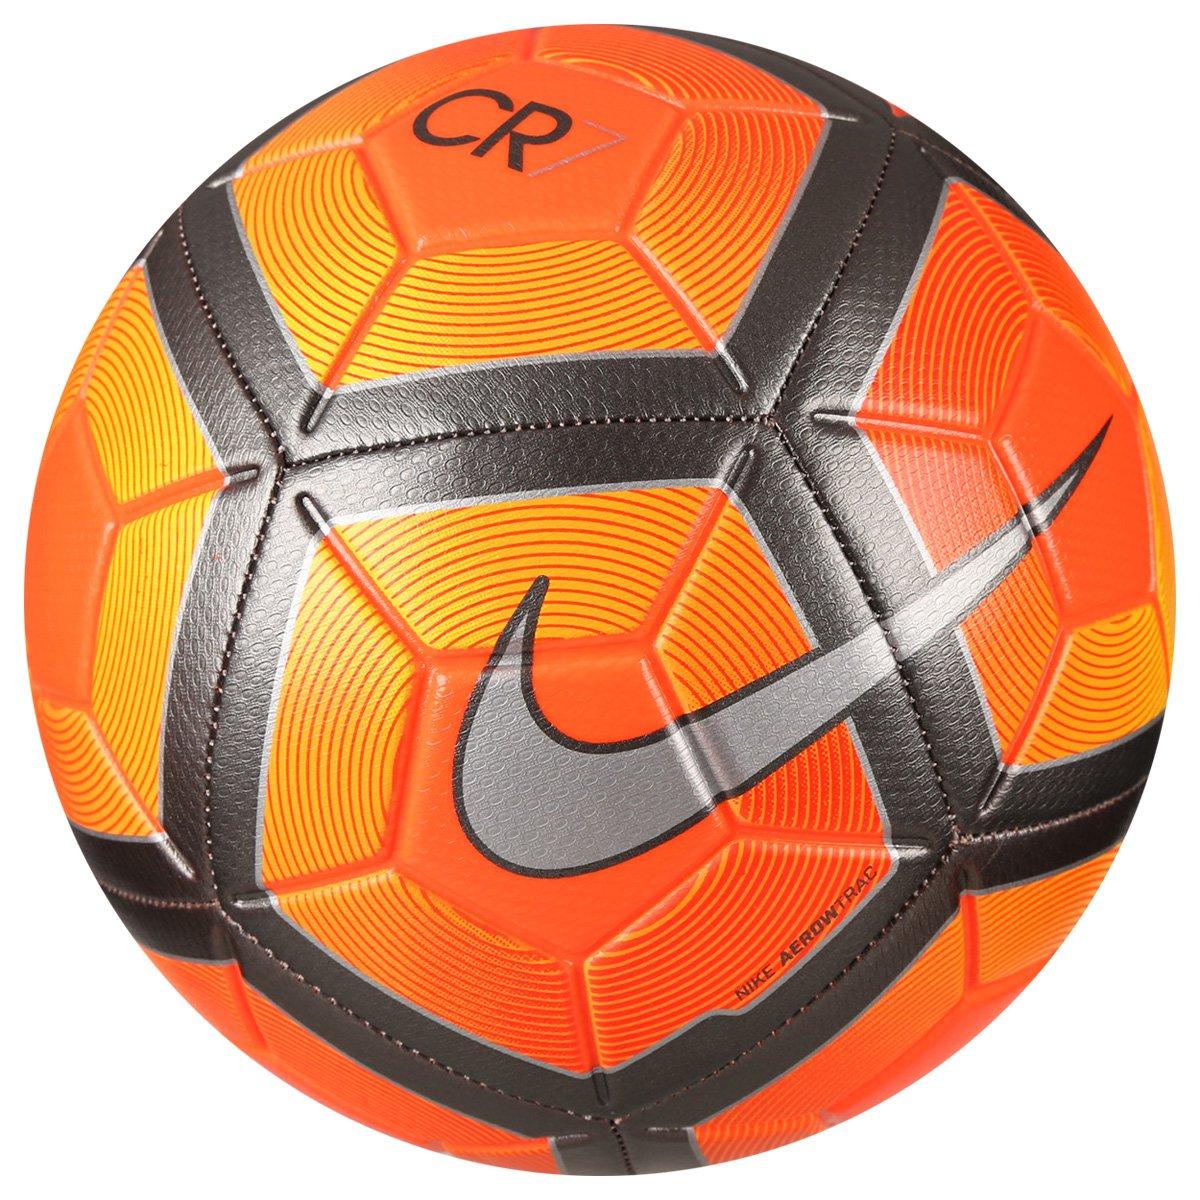 Bola Futebol Campo Nike CR7 Prestige Aerowtrac - Compre Agora  c7934931f5339